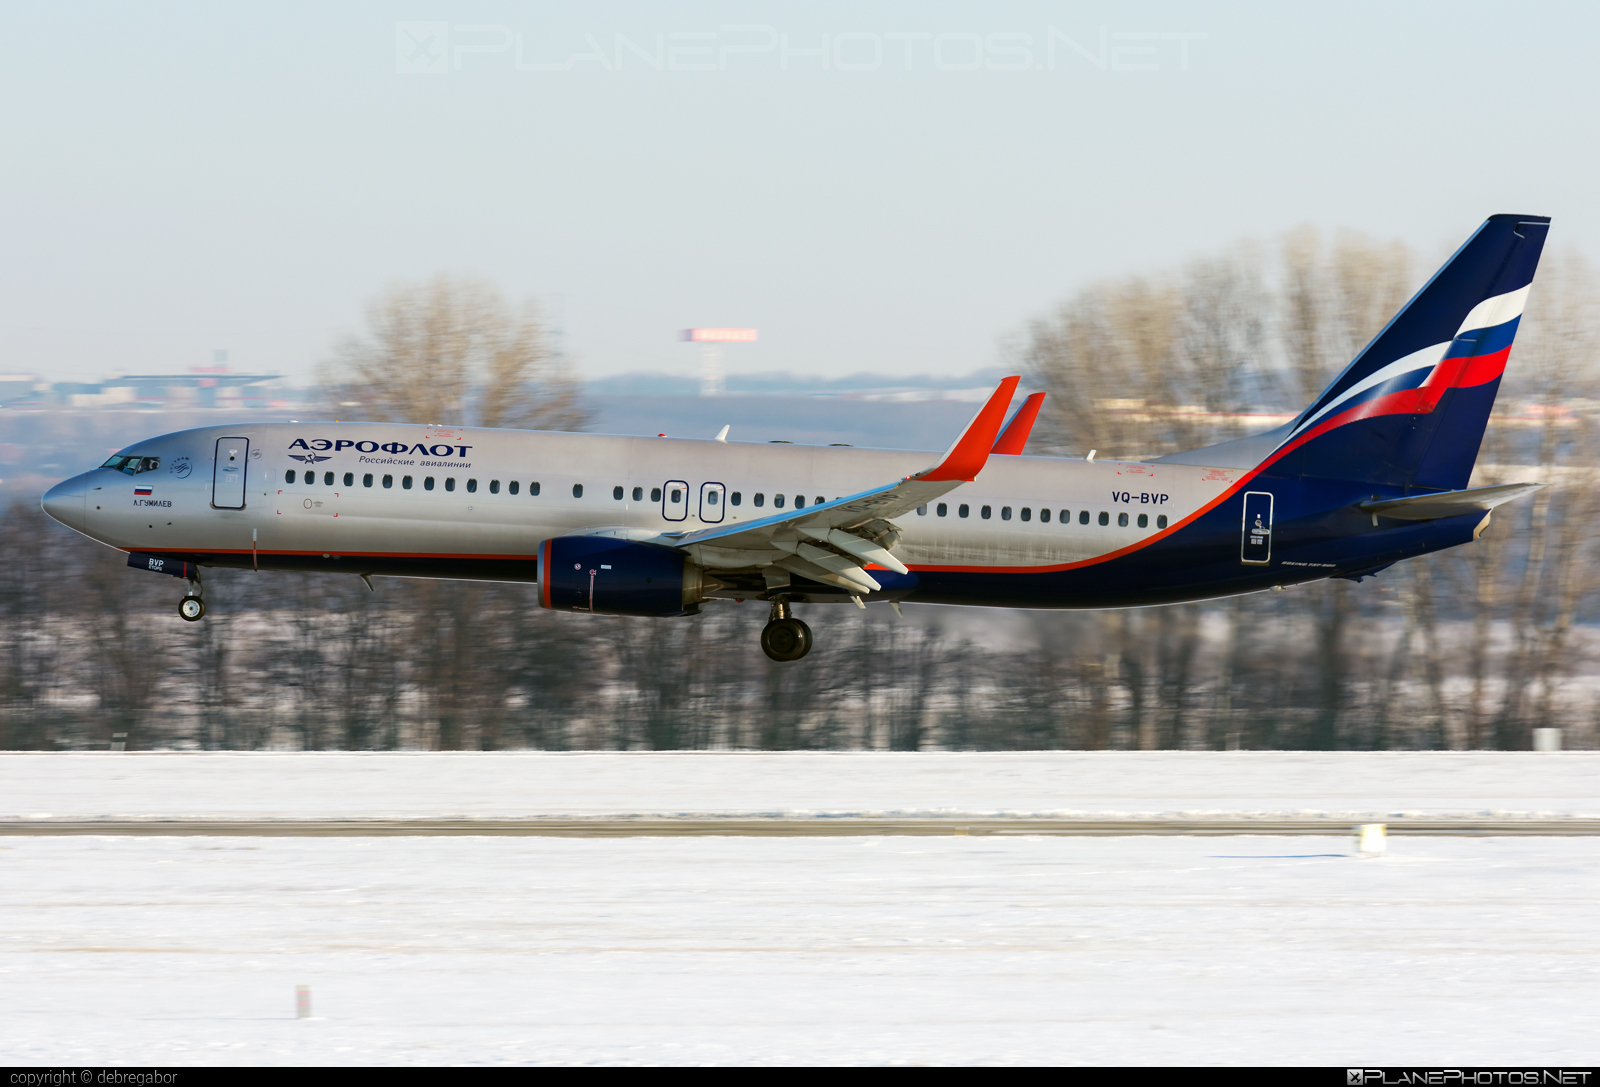 Boeing 737-800 - VQ-BVP operated by Aeroflot #aeroflot #b737 #b737nextgen #b737ng #boeing #boeing737